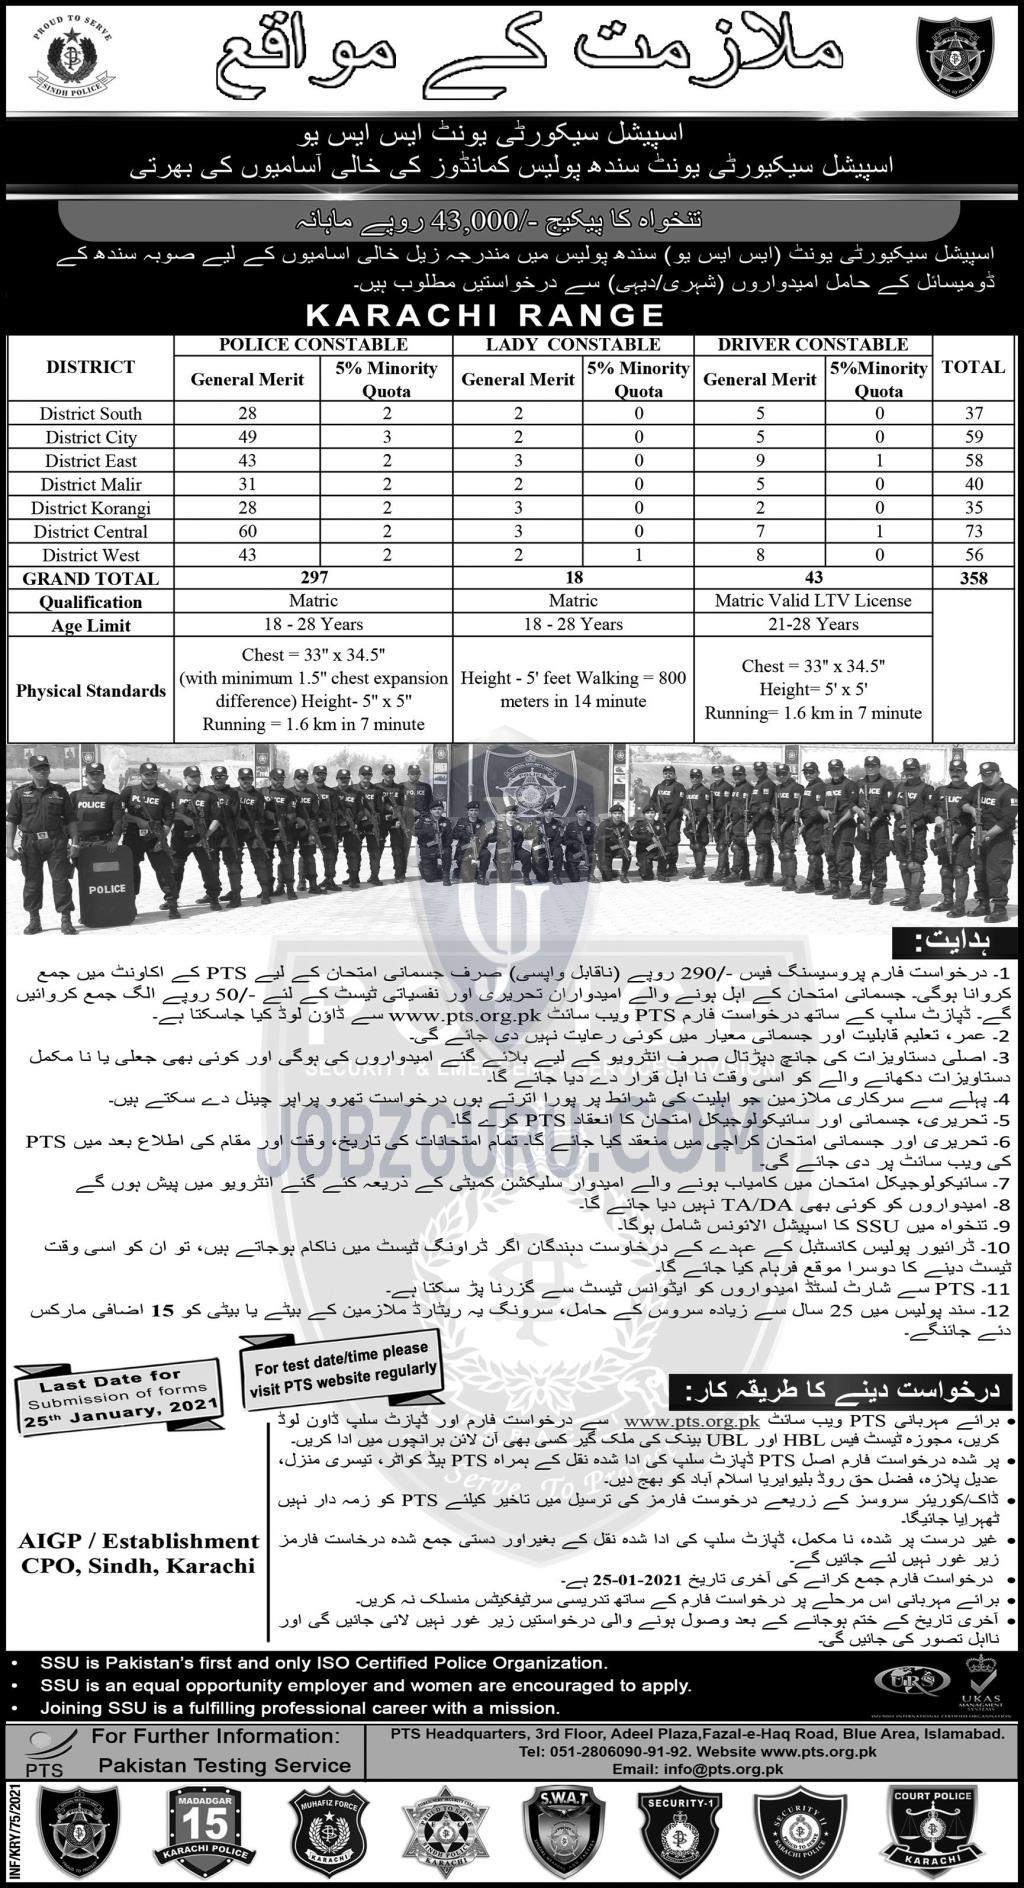 Lady Constable in Karachi on January, 2021 | Pakistan Police